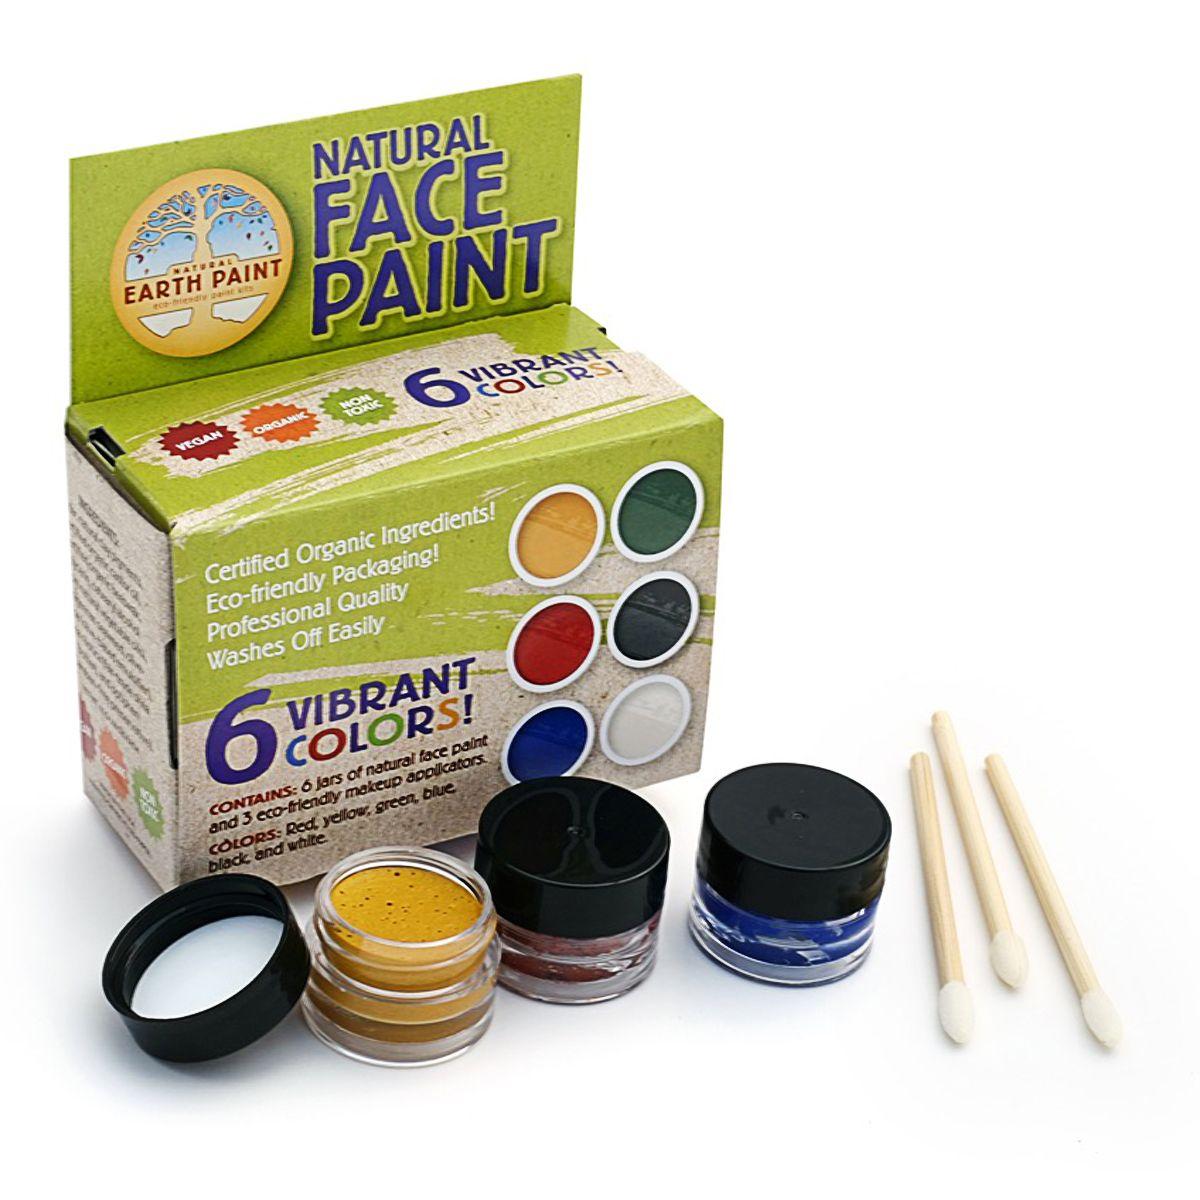 Natural Earth Paint Natural Face Paint Kit Face Paint Kit